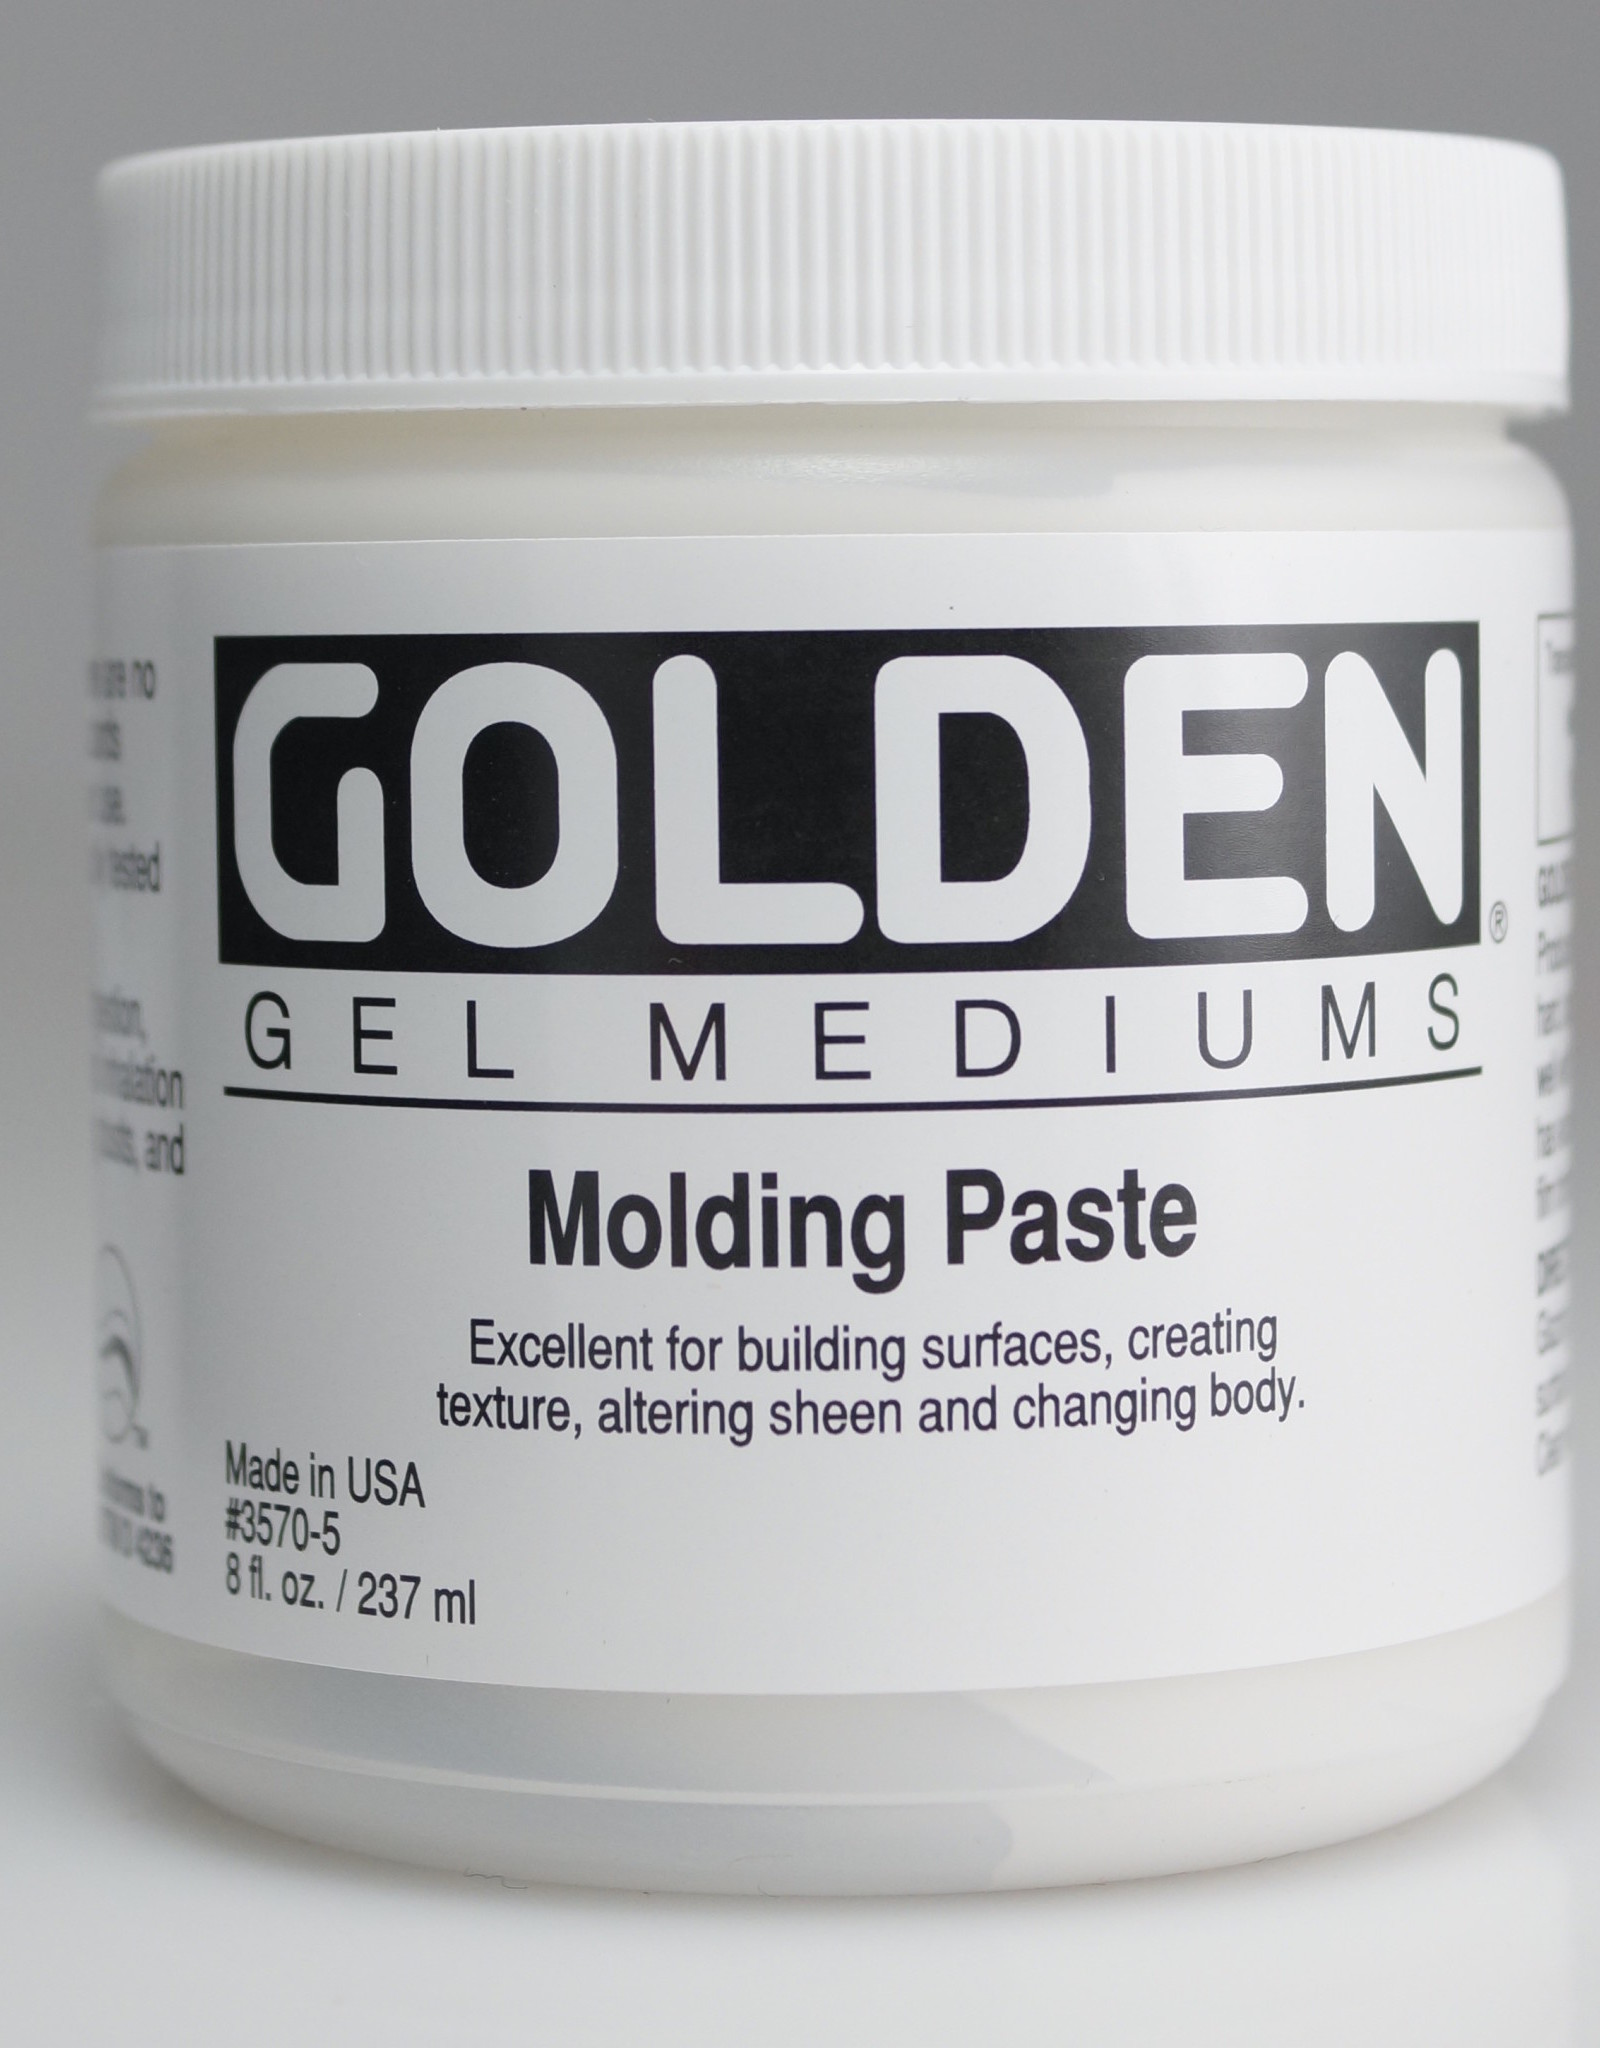 Golden, Molding Paste, Medium, 8 oz Jar